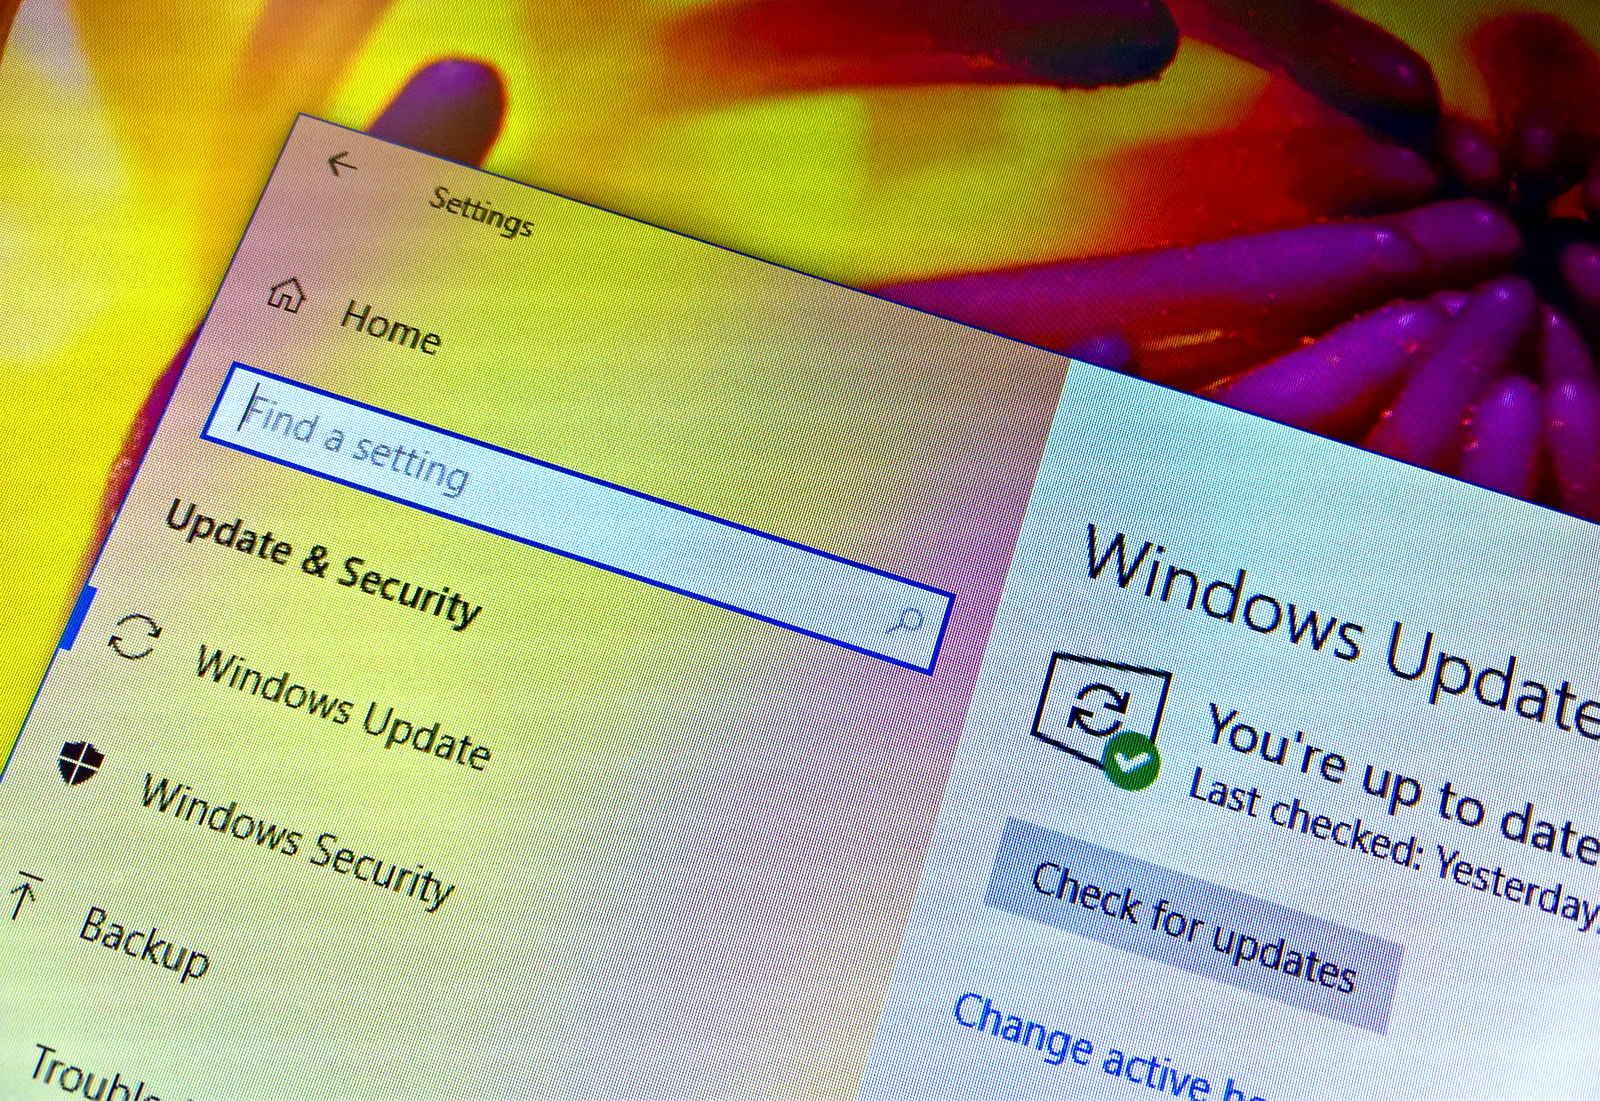 Windows 10 version 1803 after upgrade